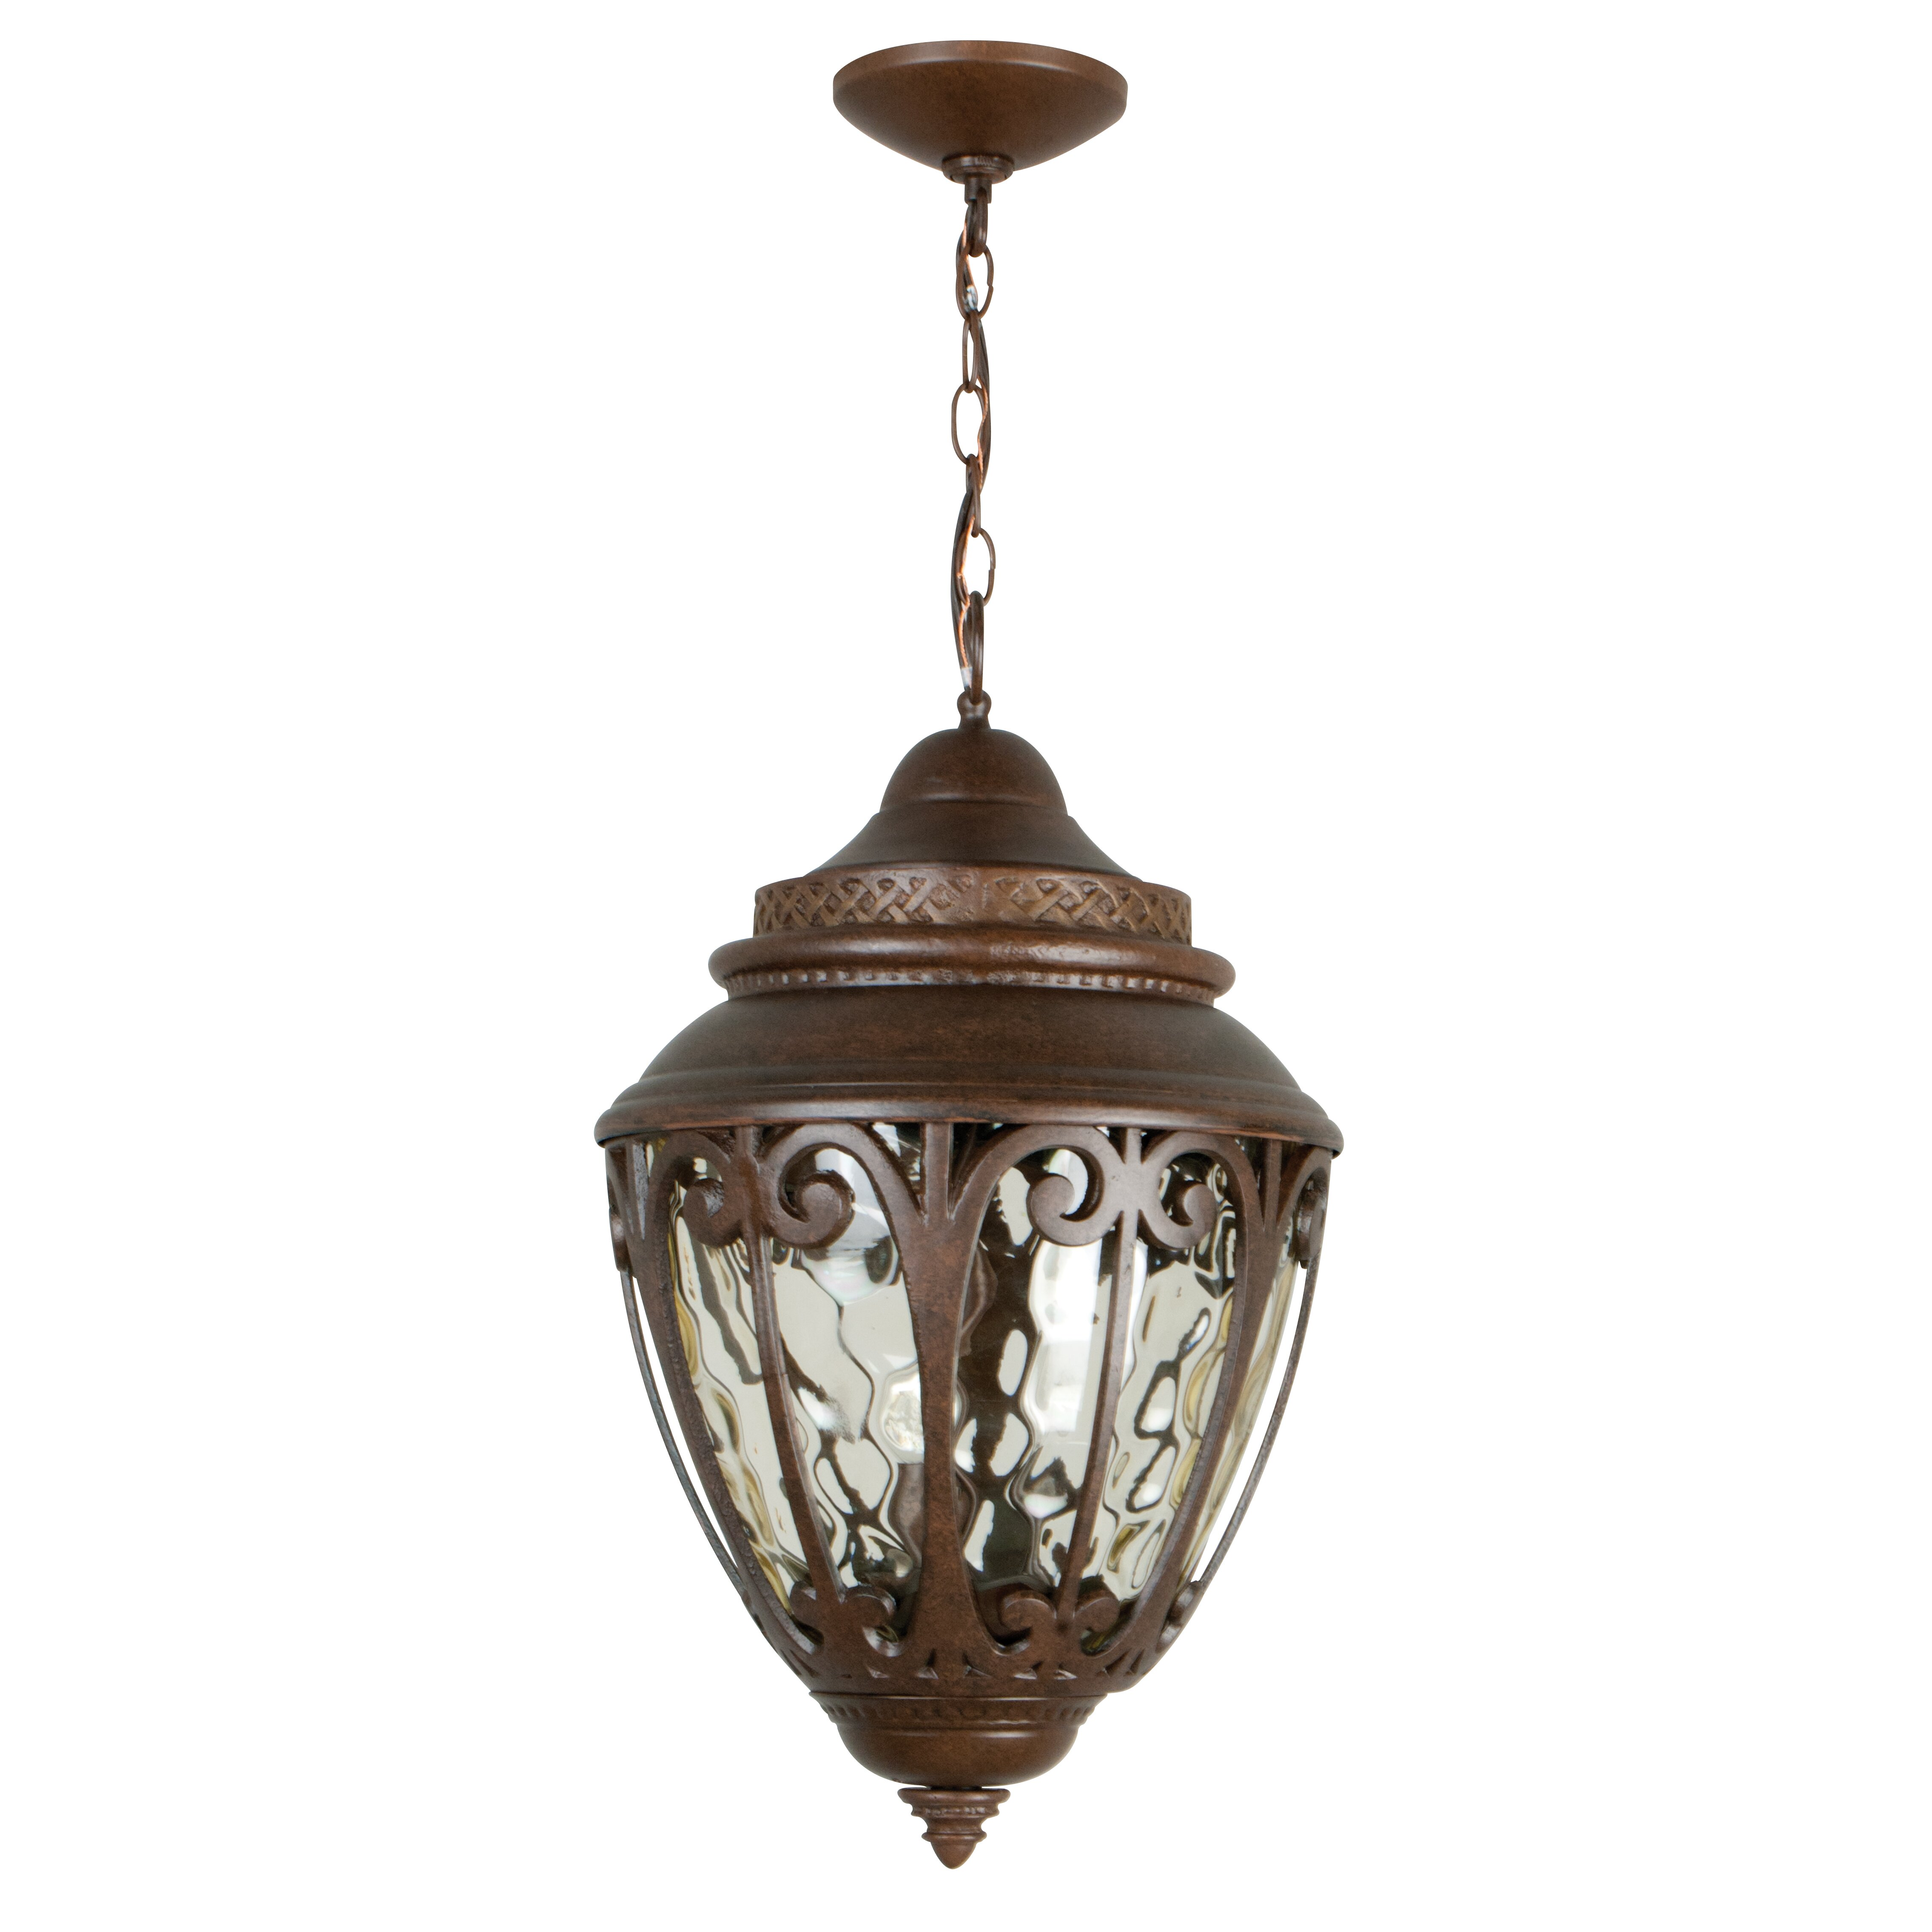 Wayfair Outdoor Hanging Lights: Craftmade 3 Light Outdoor Hanging Lantern